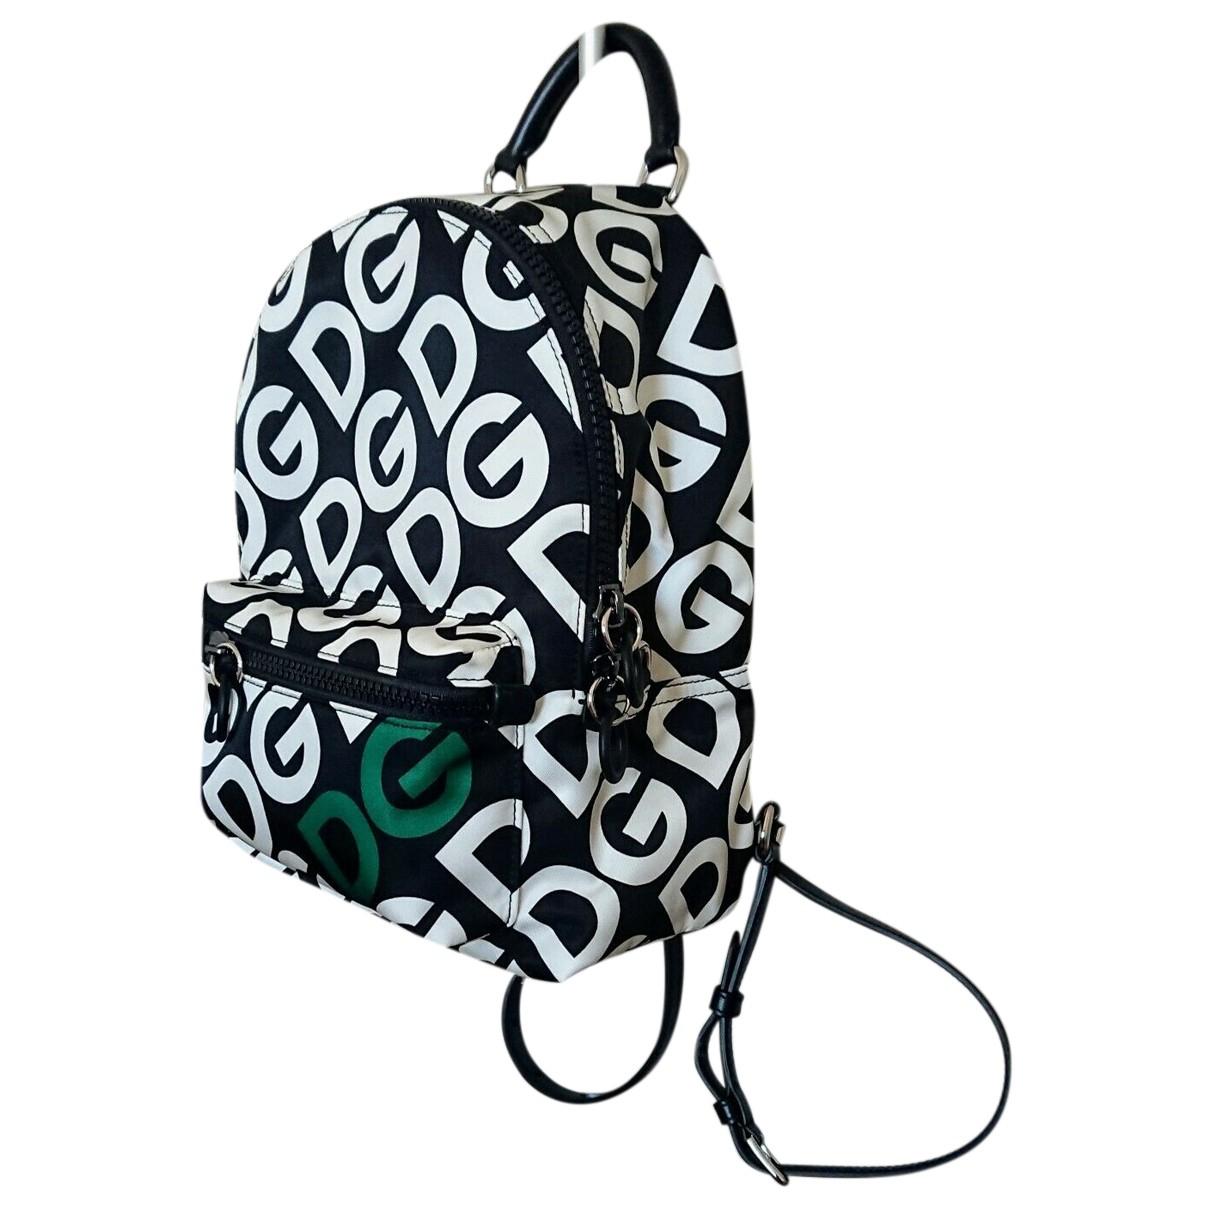 Dolce & Gabbana N Black Leather backpack for Women N